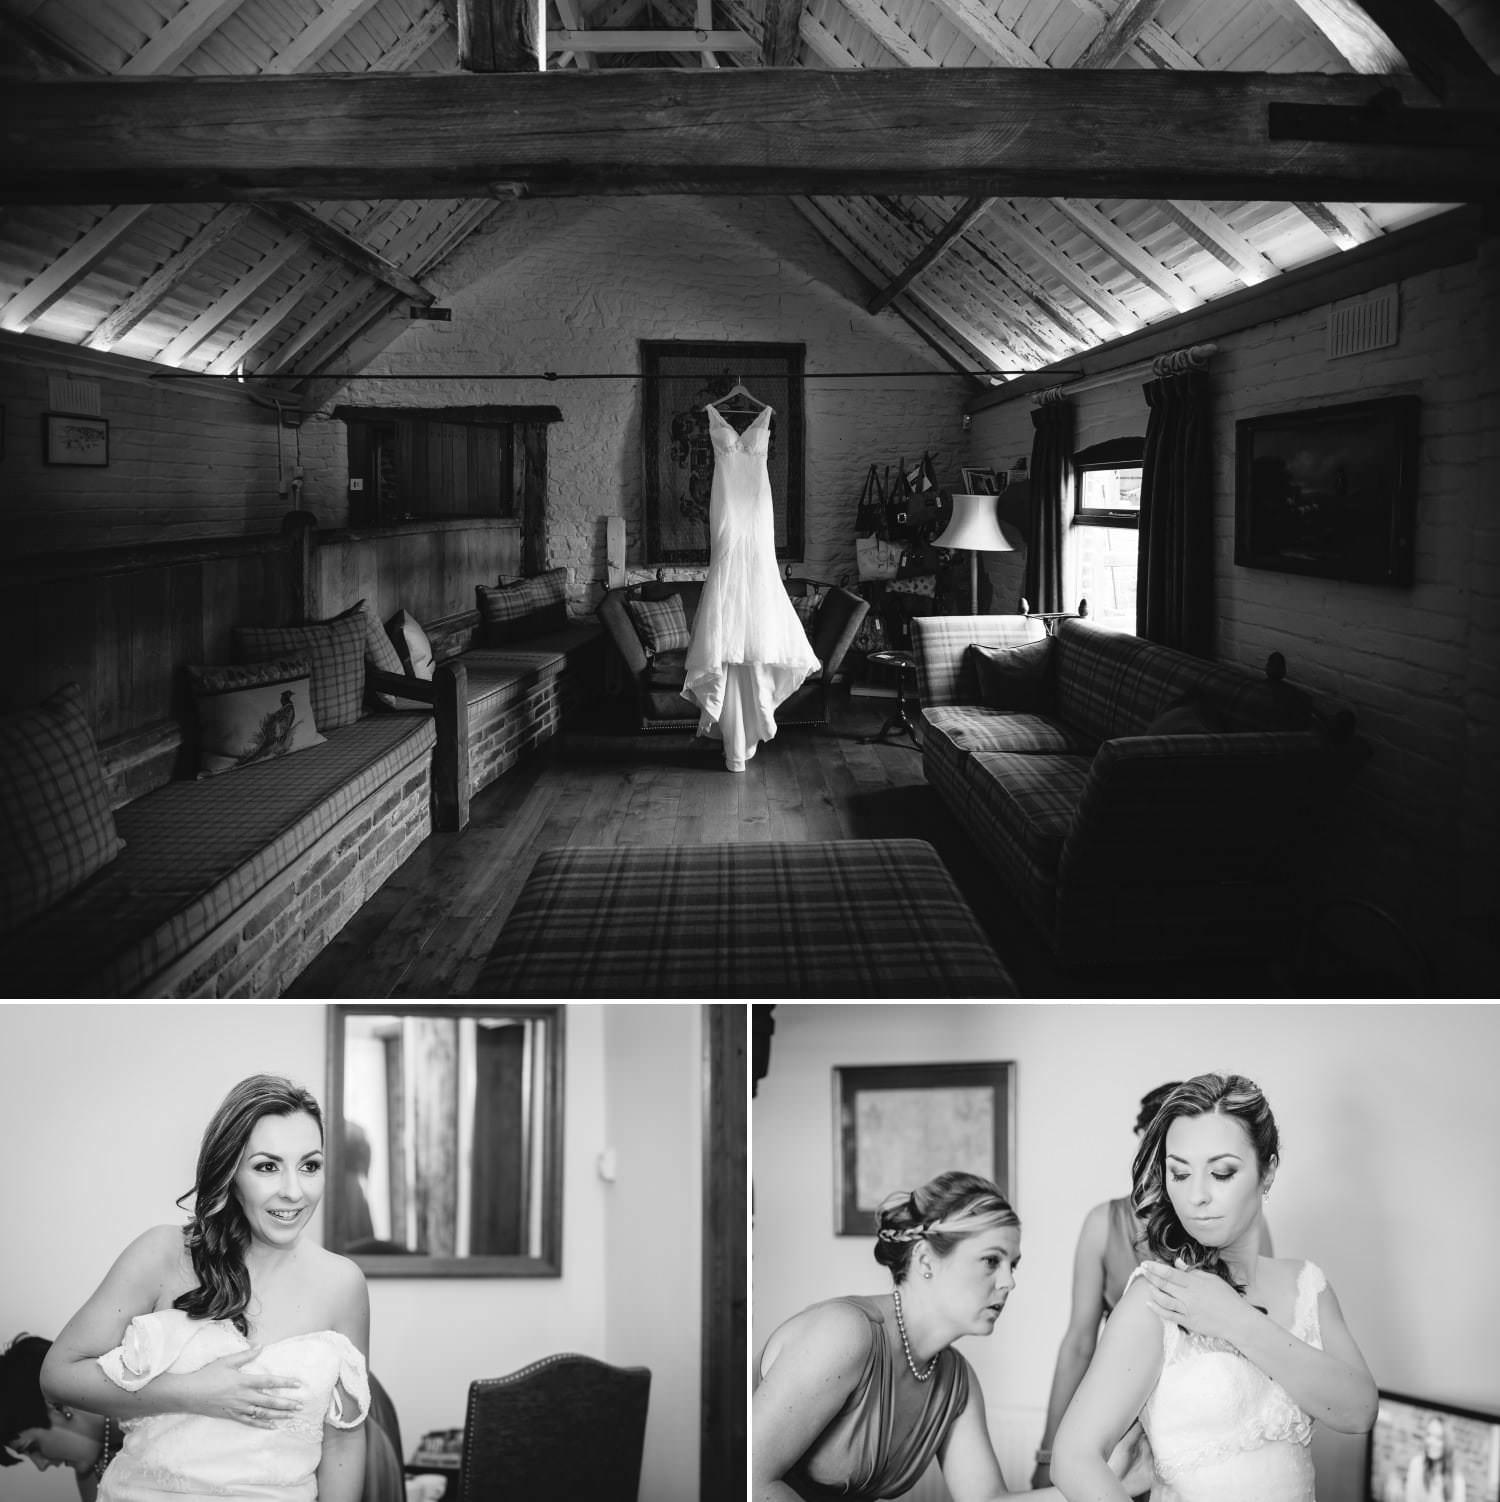 Weding Photography Shropshire Old Dowton Lodge